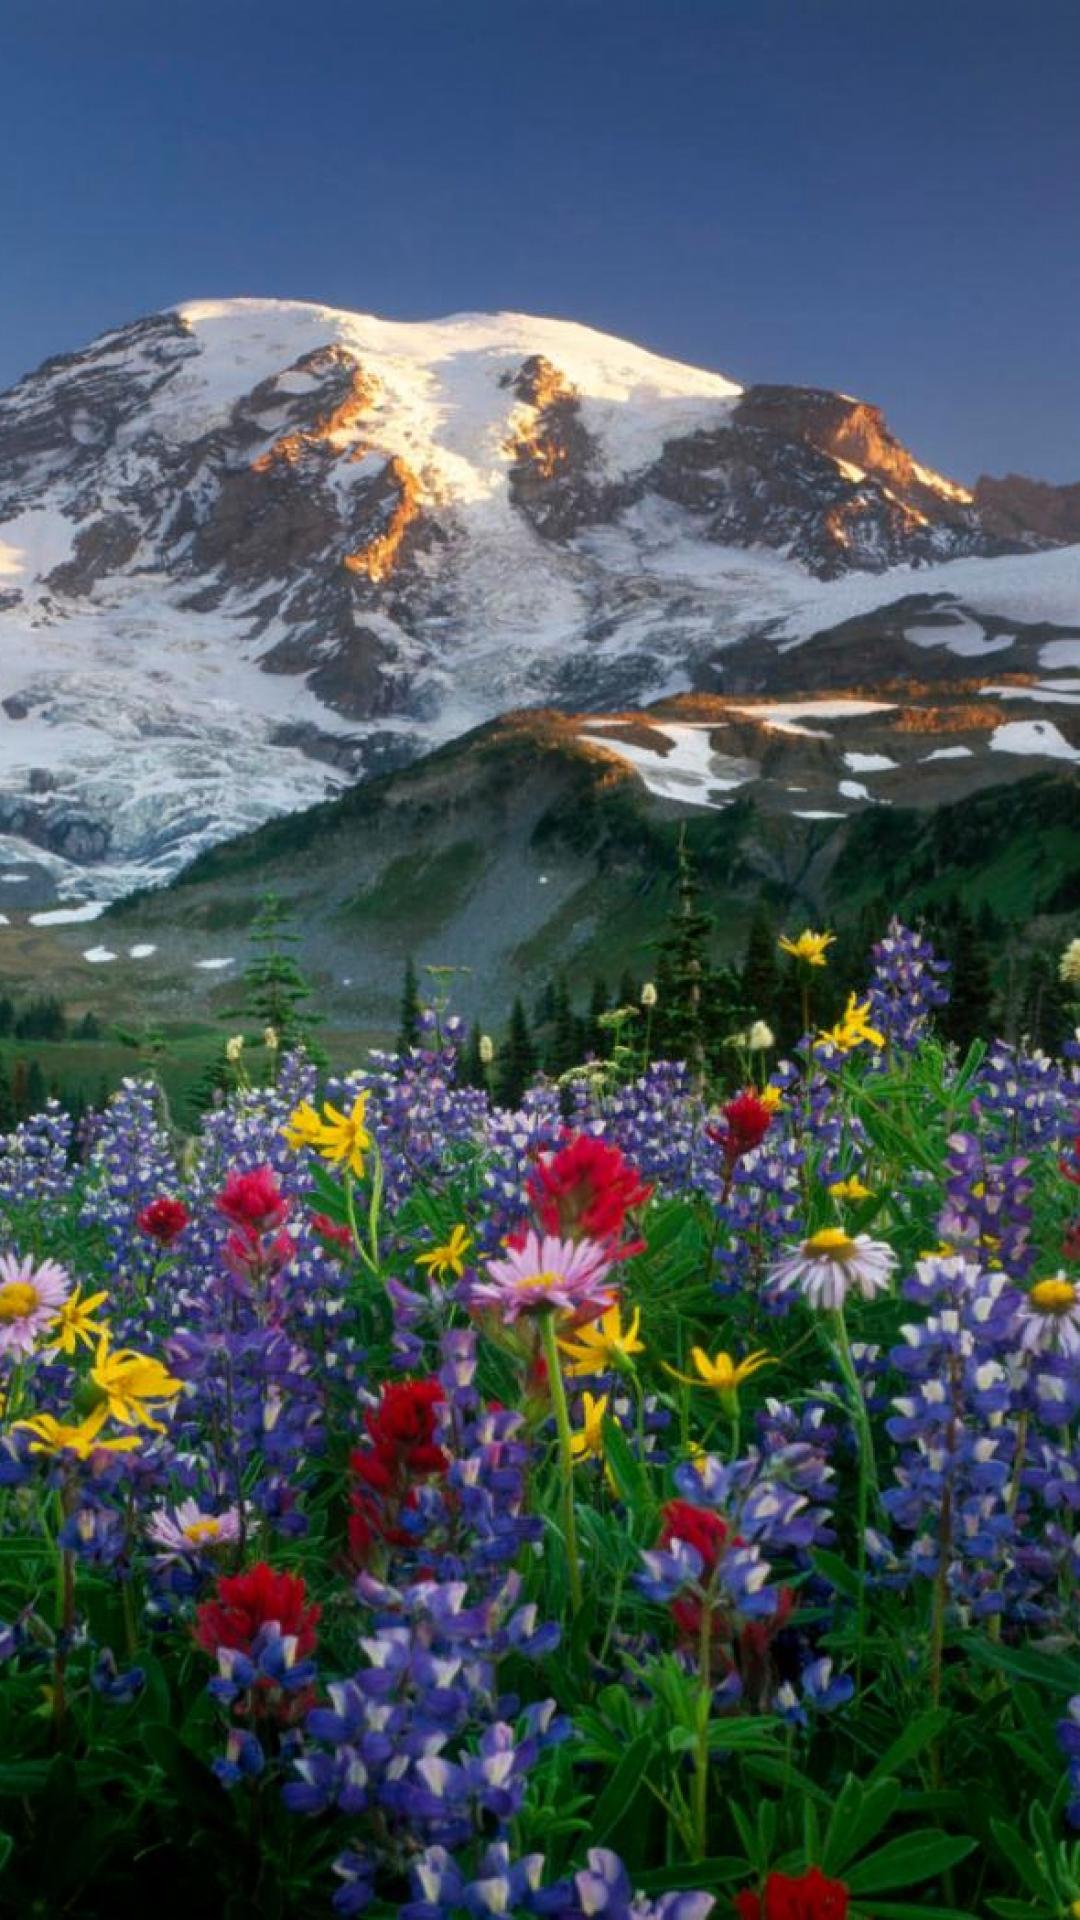 Top Wallpaper Mountain Flower - lupines-flowers-fields-mountains-trees-nature-snow-wallpaper-wpc9007355  HD_51671.jpg